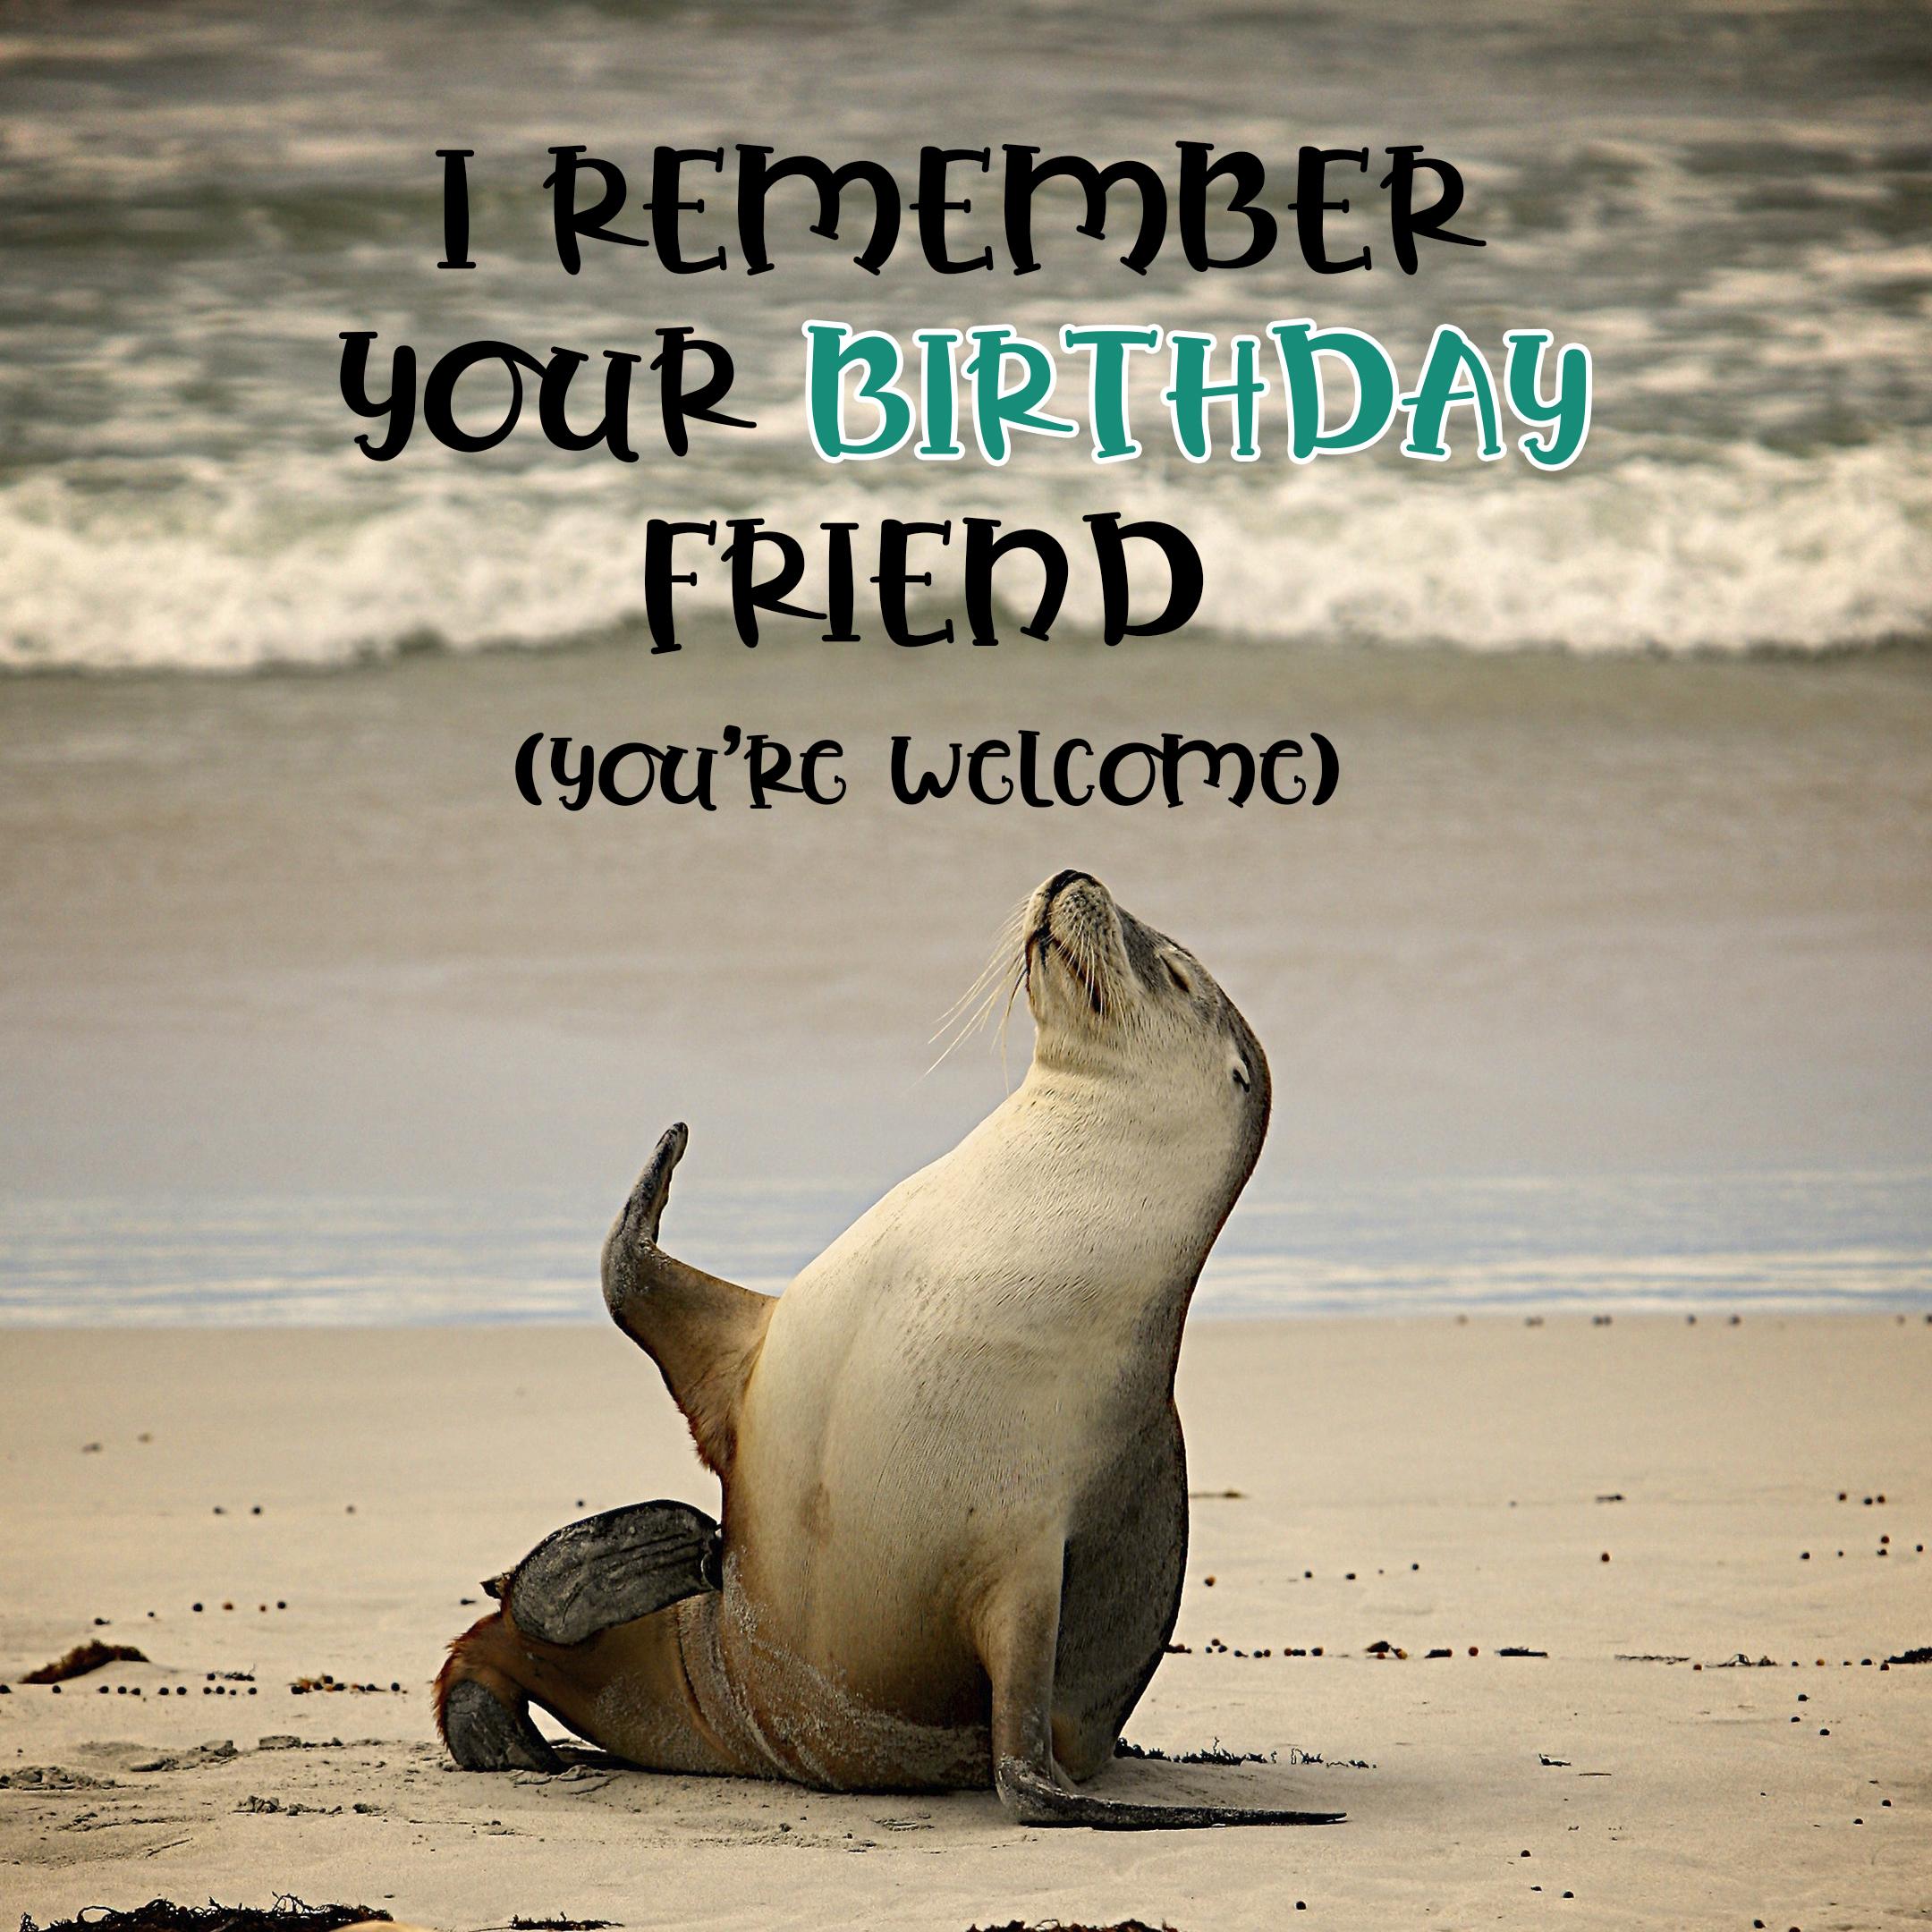 Free Friend Happy Birthday Image With Funny Seal - birthdayimg.com